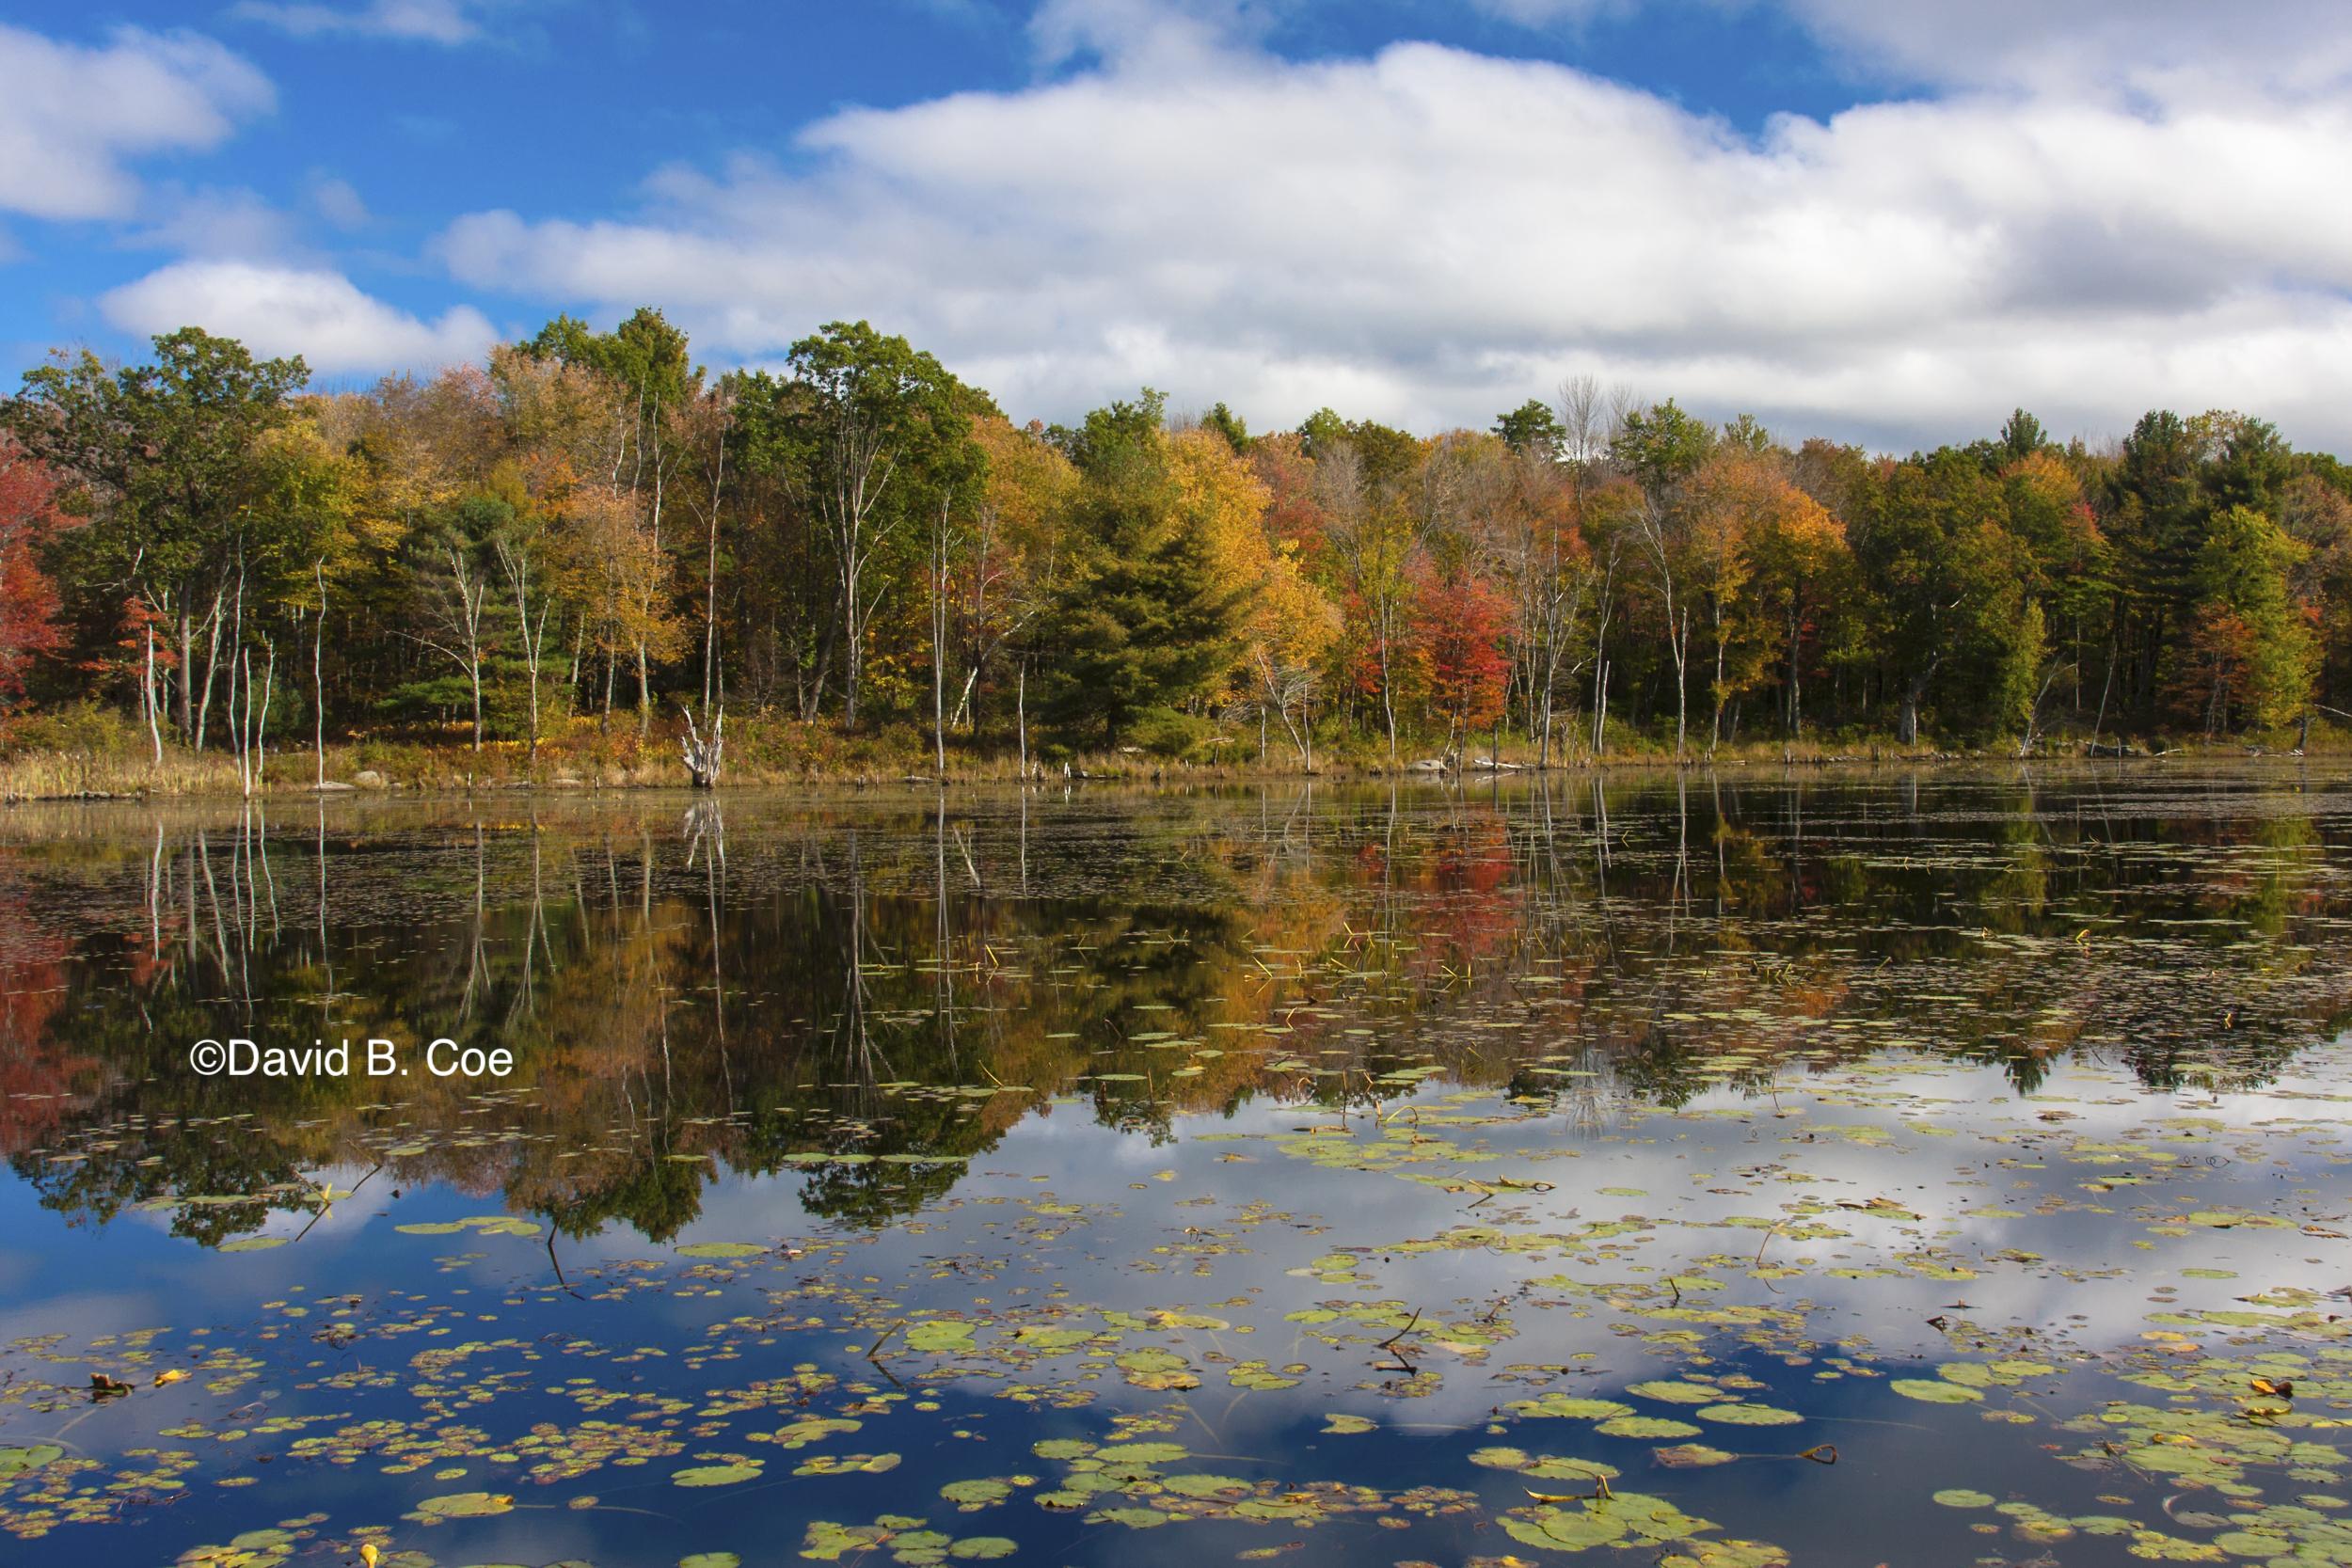 Wachusett Meadow Fall, by David B. Coe